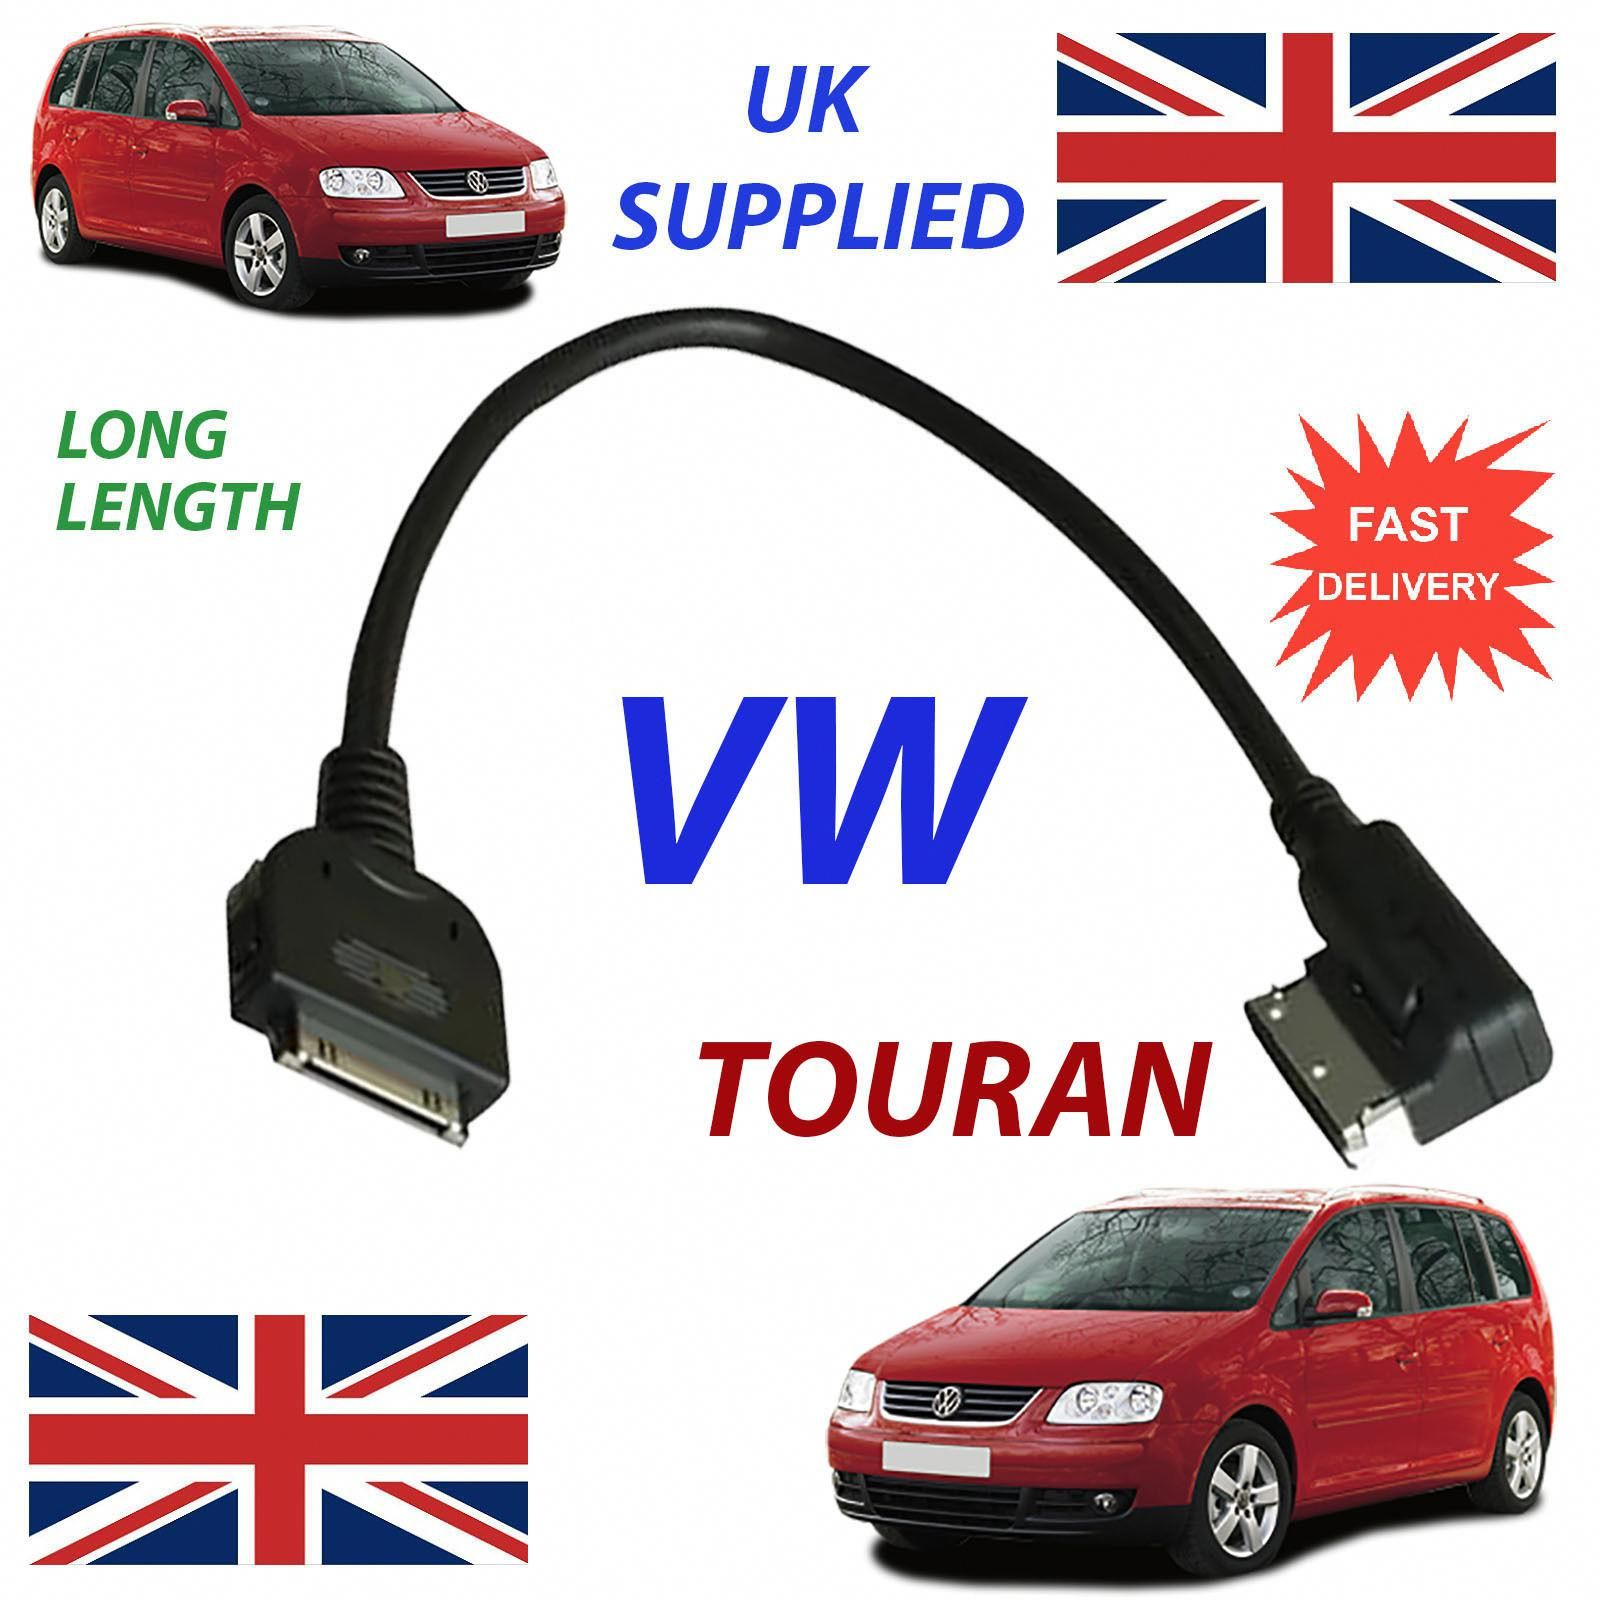 Vw Touran Mdi 0051446L Long Length Iphone Ipod In Car